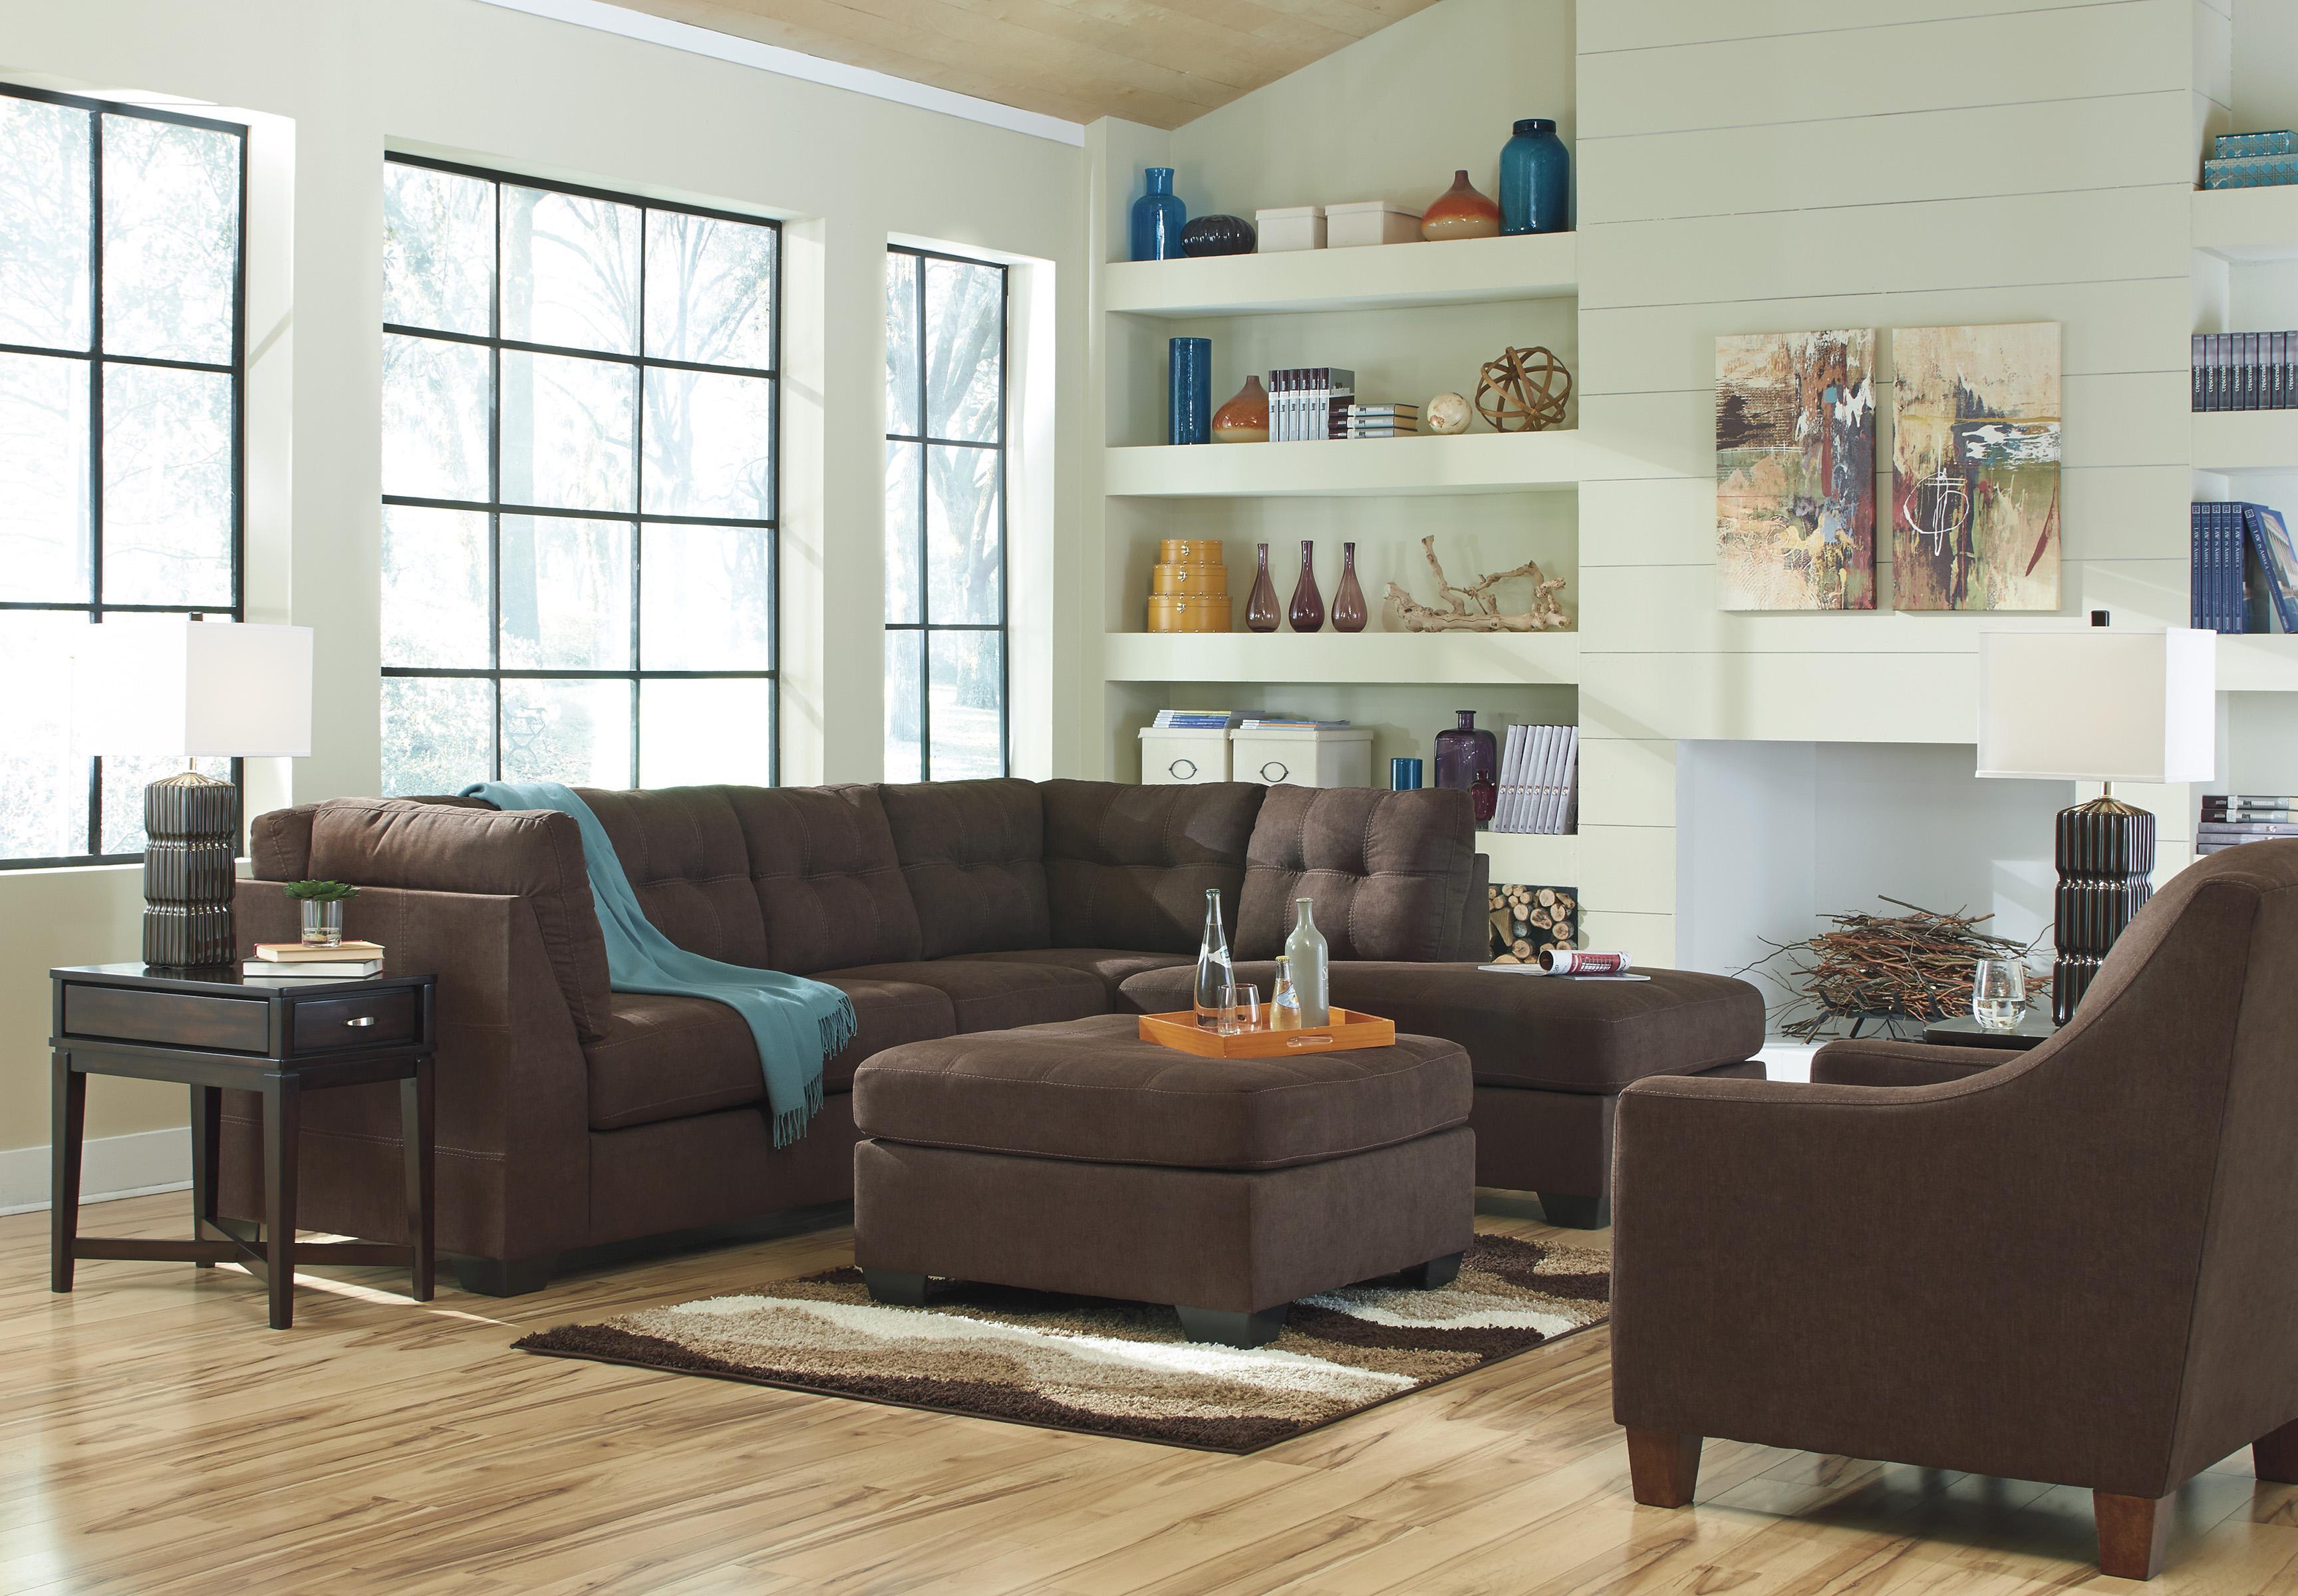 Value City Furniture In Green Brook Nj